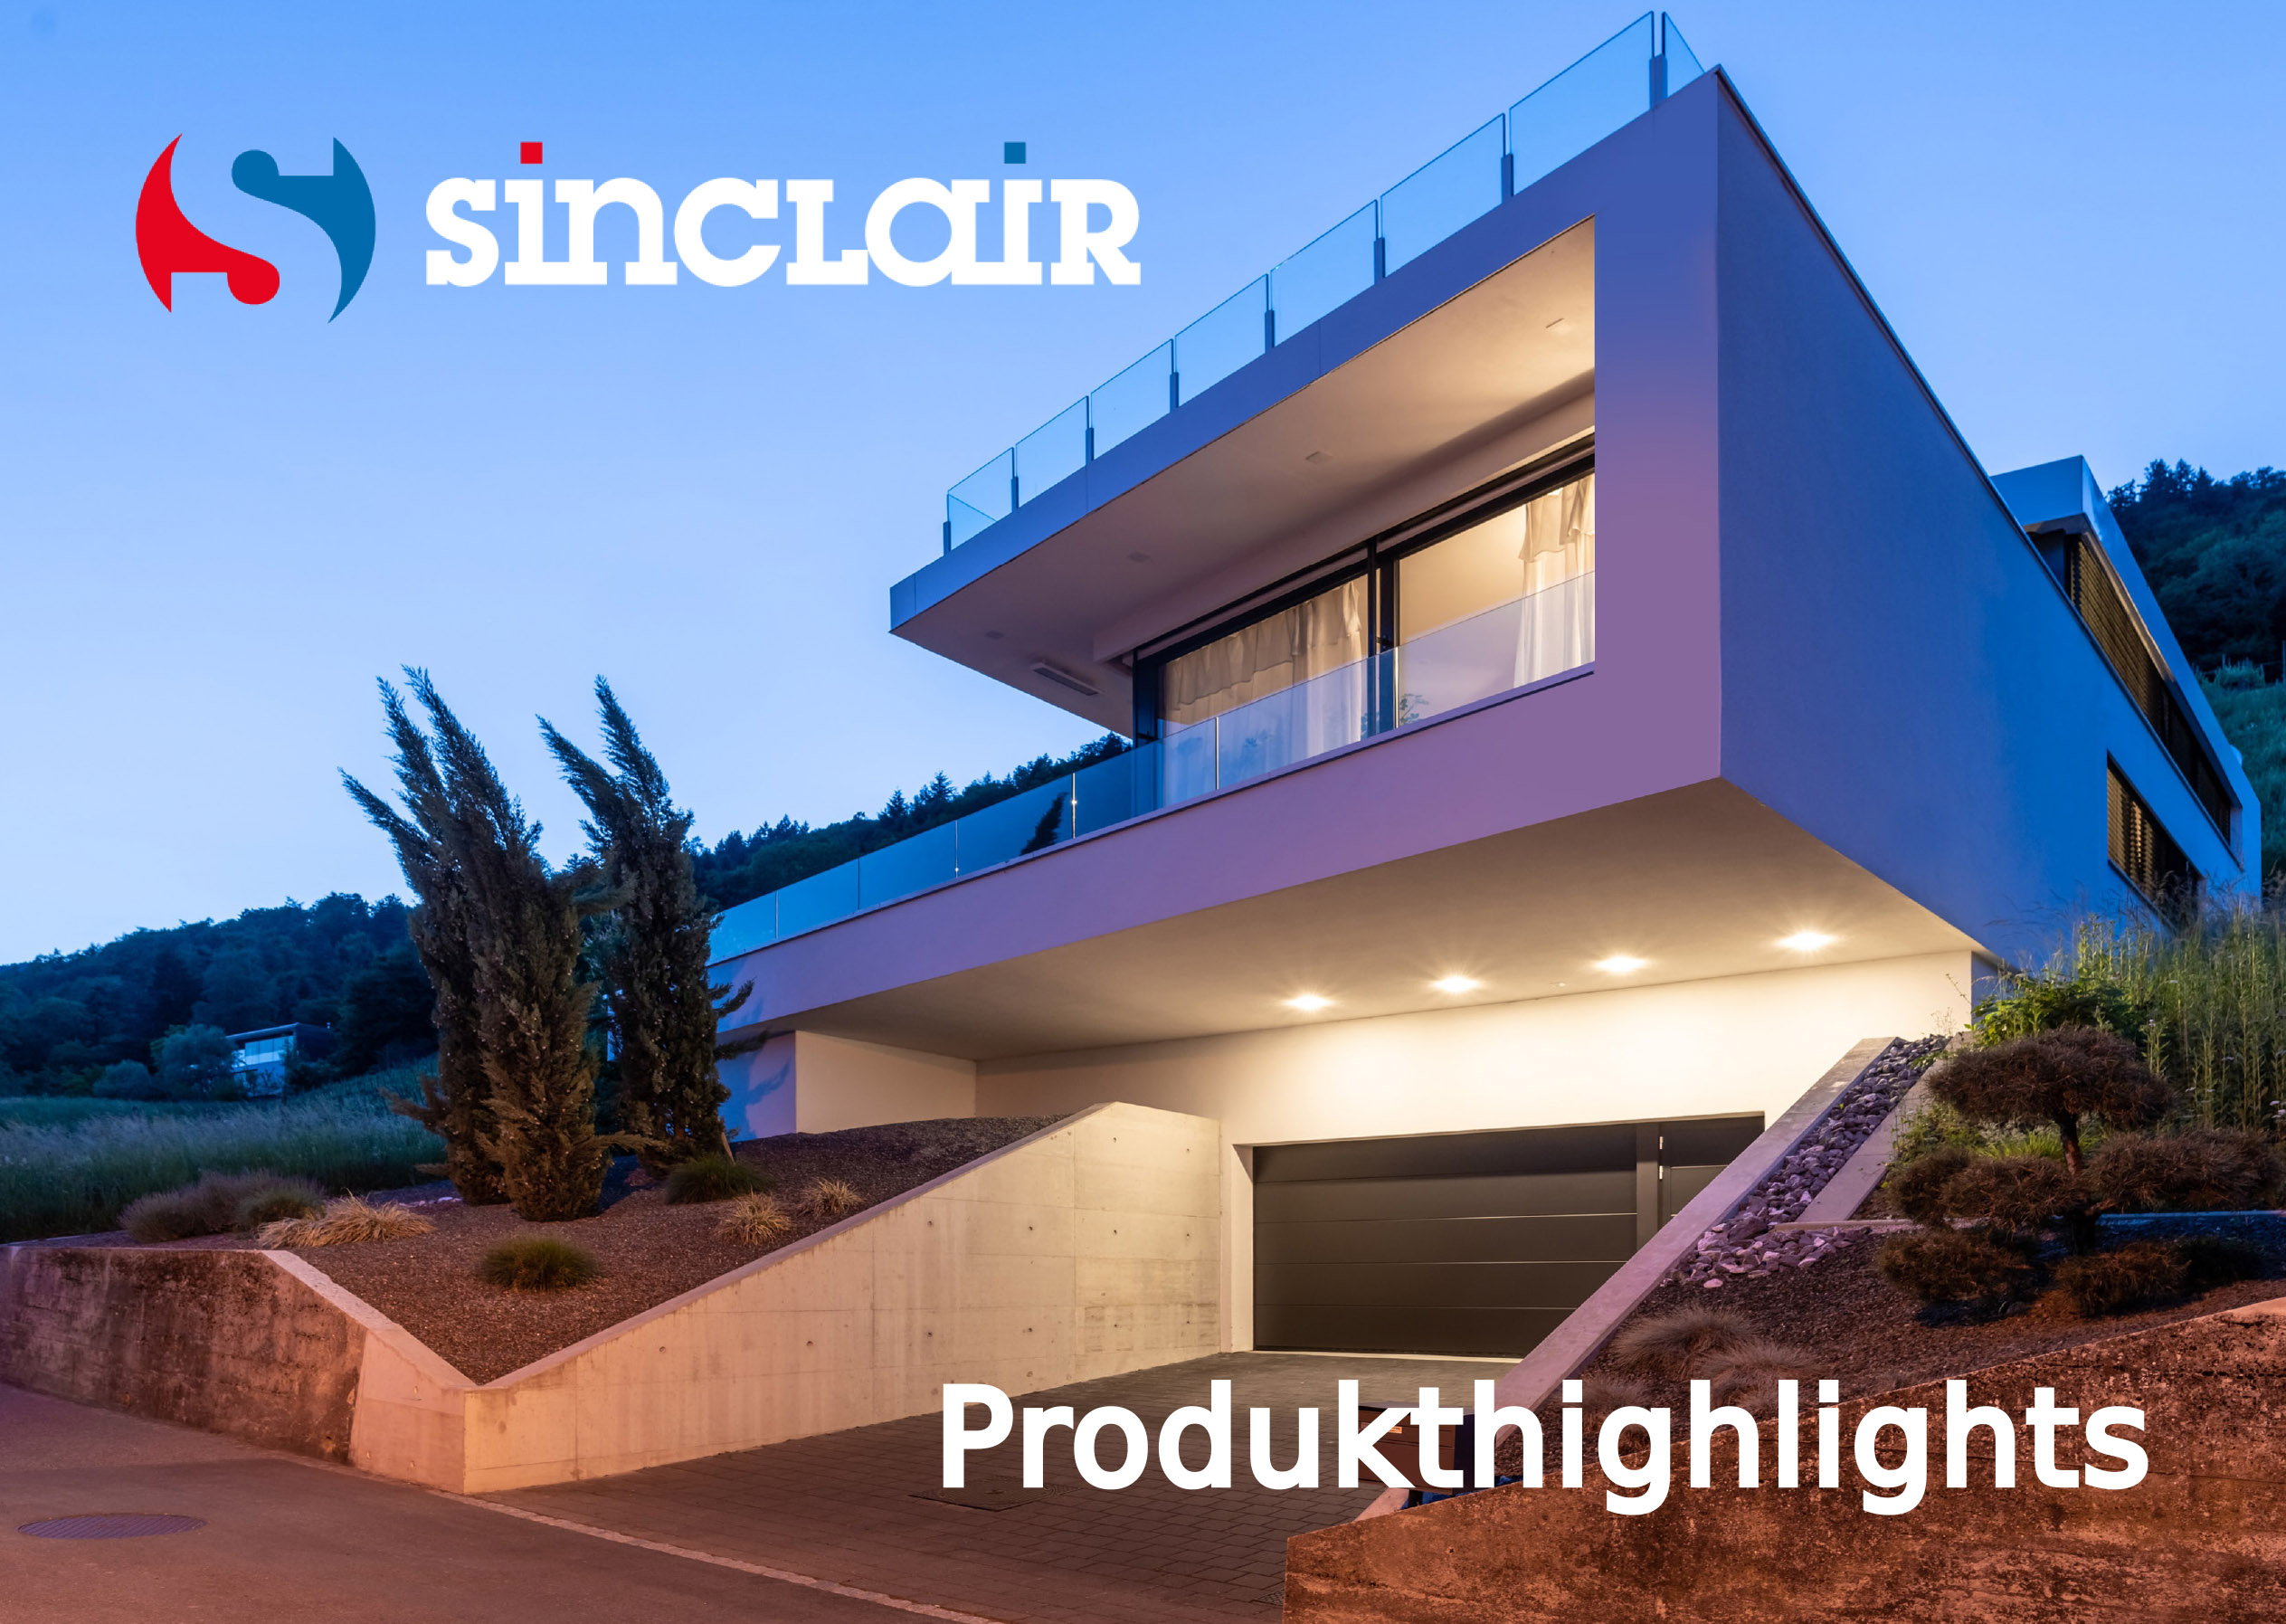 SINCLAIR Produkthighlights